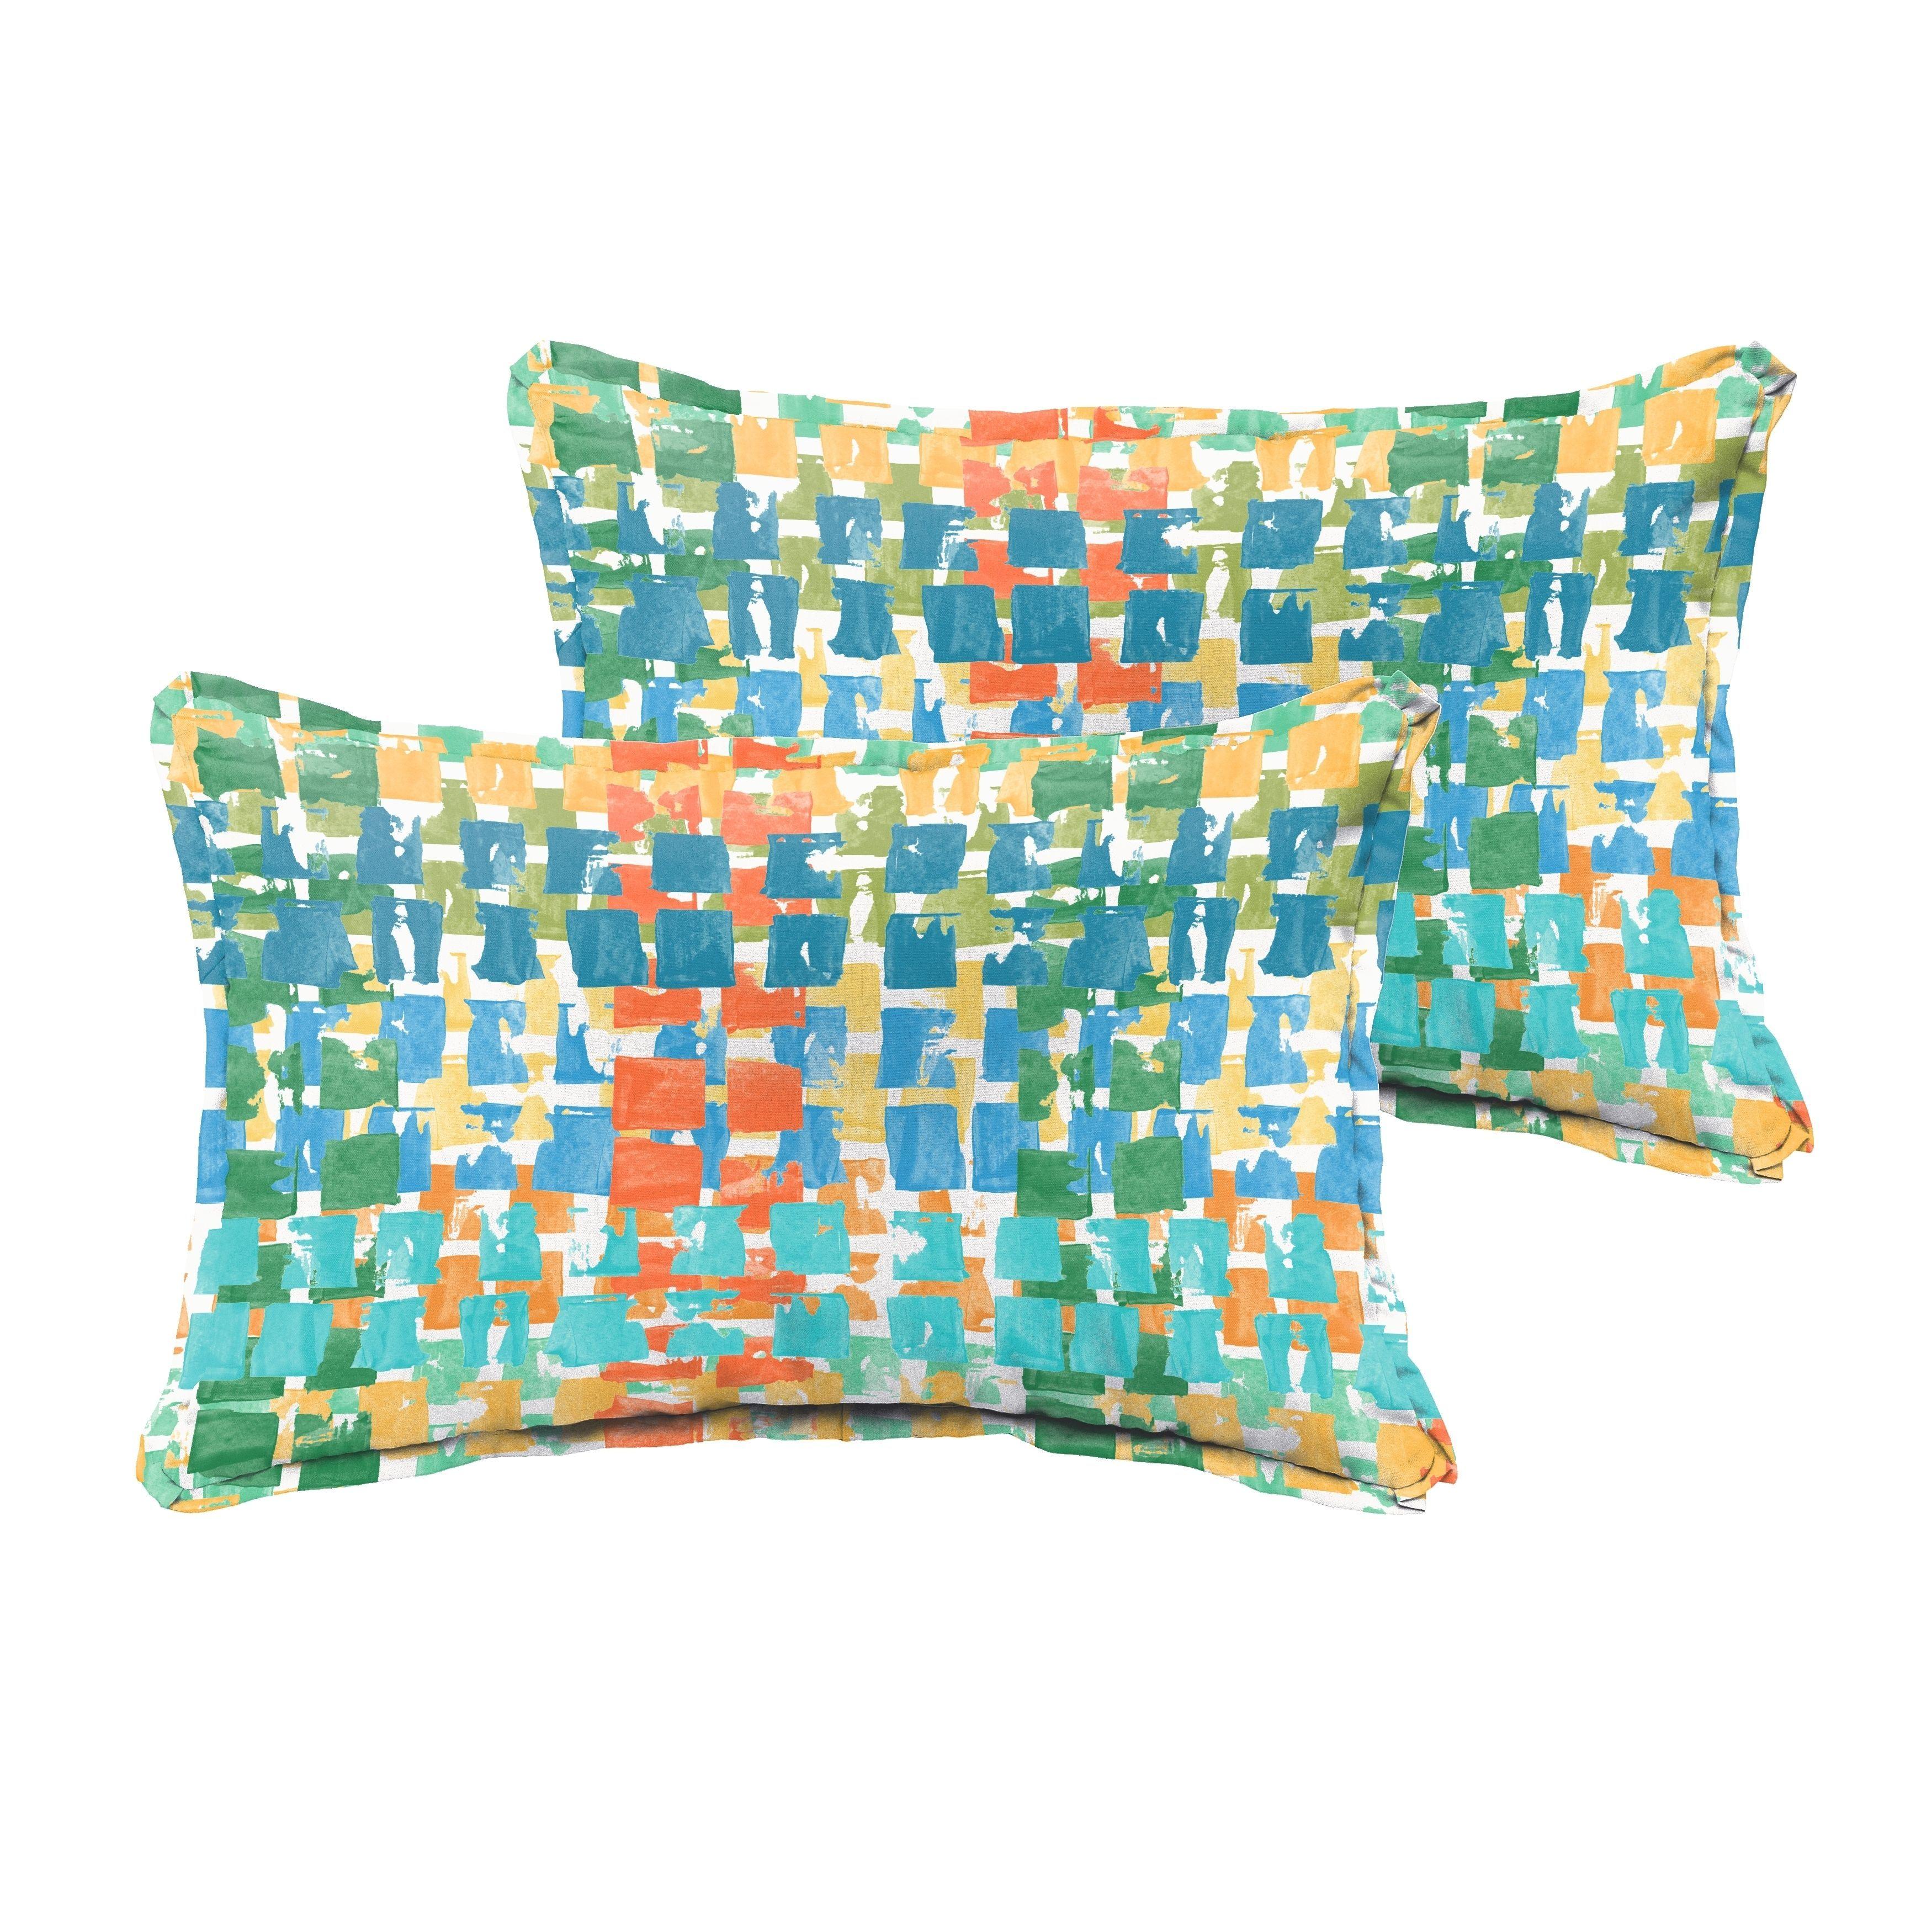 Selena Blue Green Squares Indoor/ Outdoor Flange Lumbar Pillows (Set of 2) (13 x 20) (Fabric), Outdoor Cushion